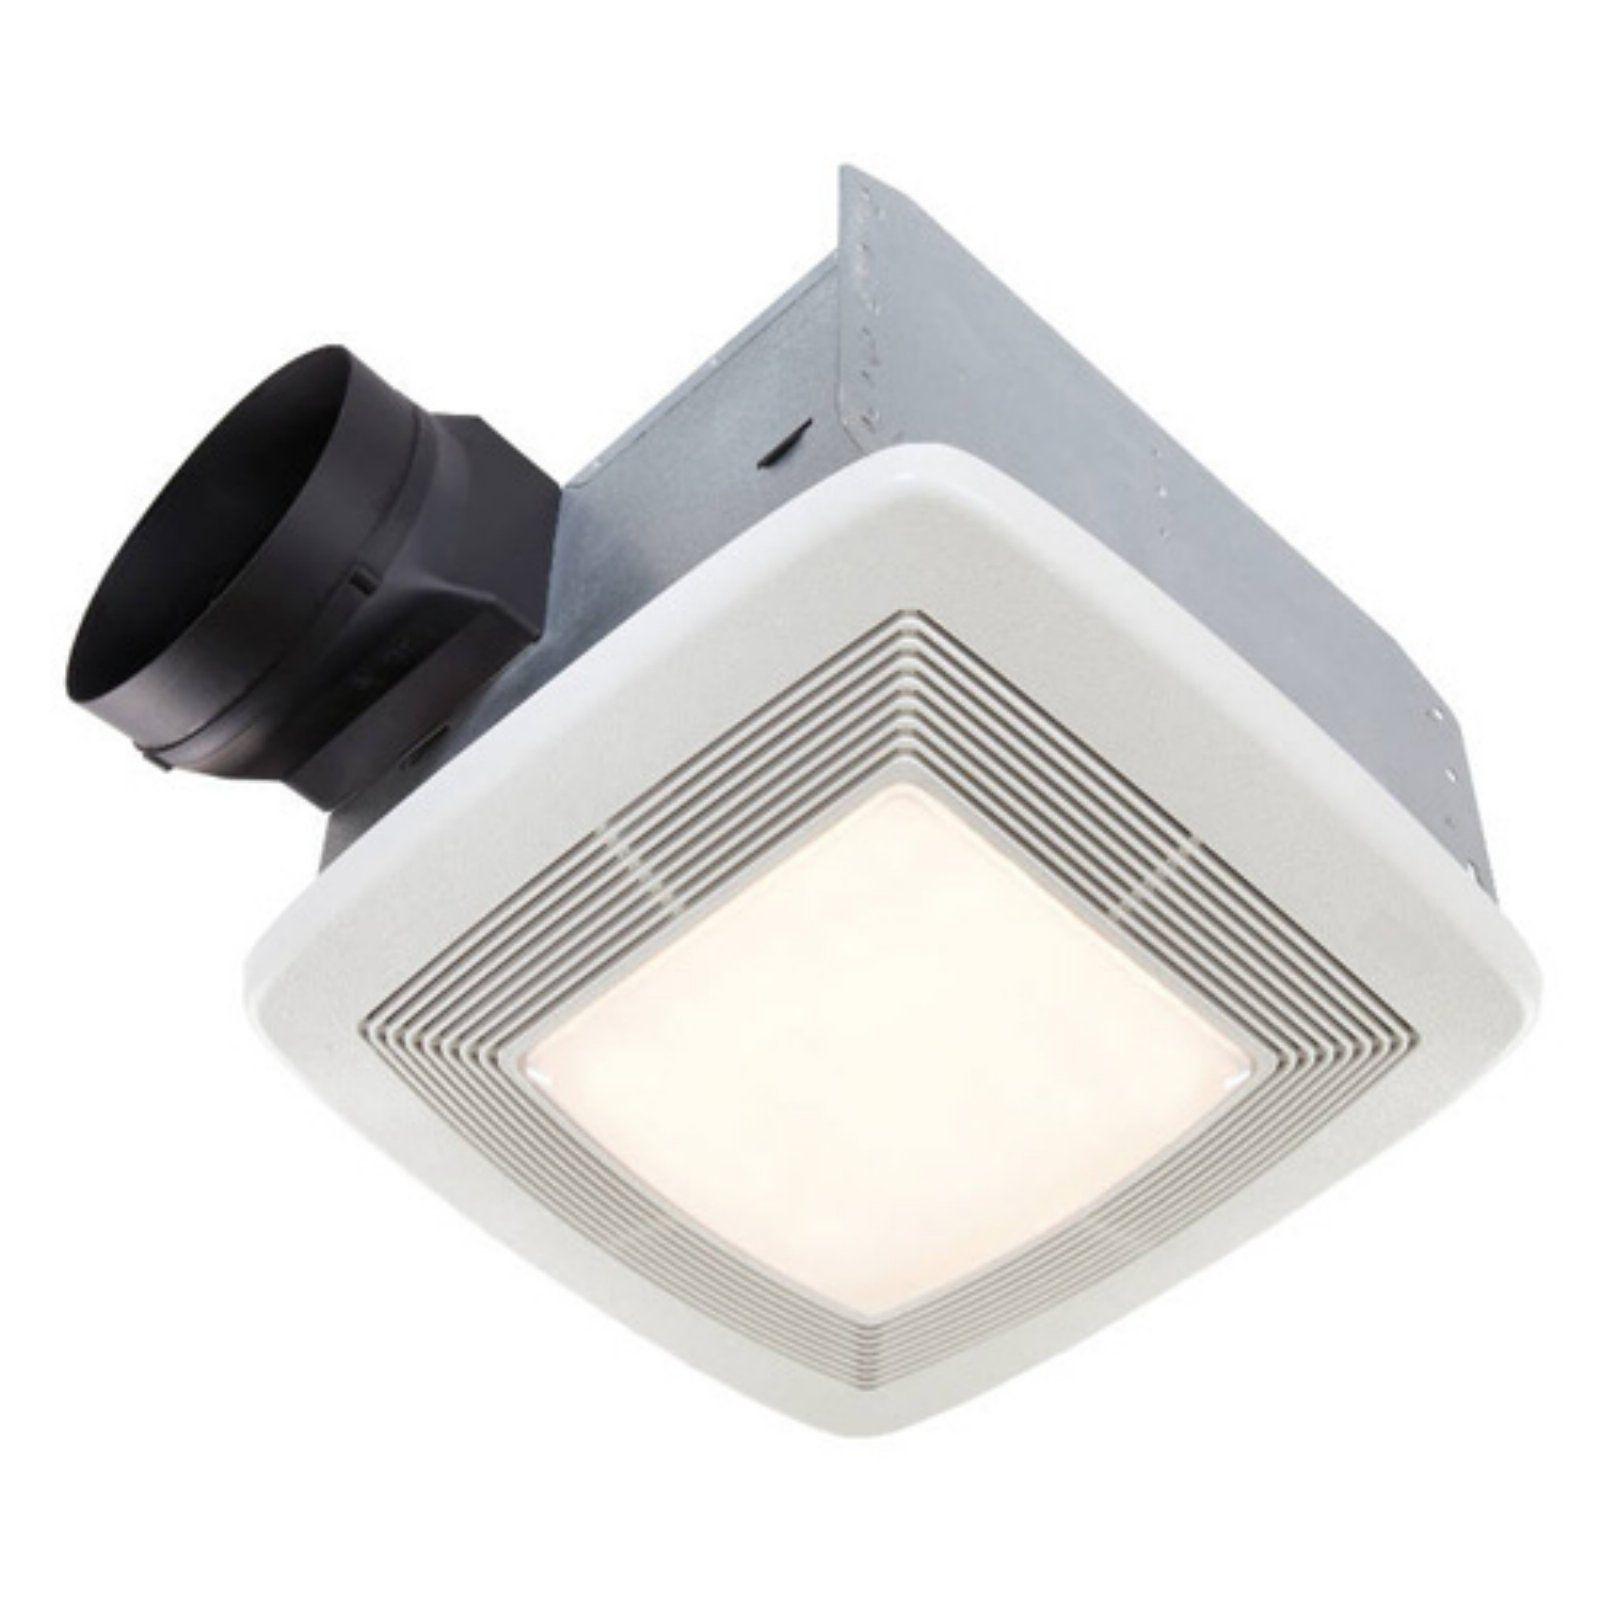 Broan Nutone Qtxe150flt Ultra Silent Bathroom Fan Light Night